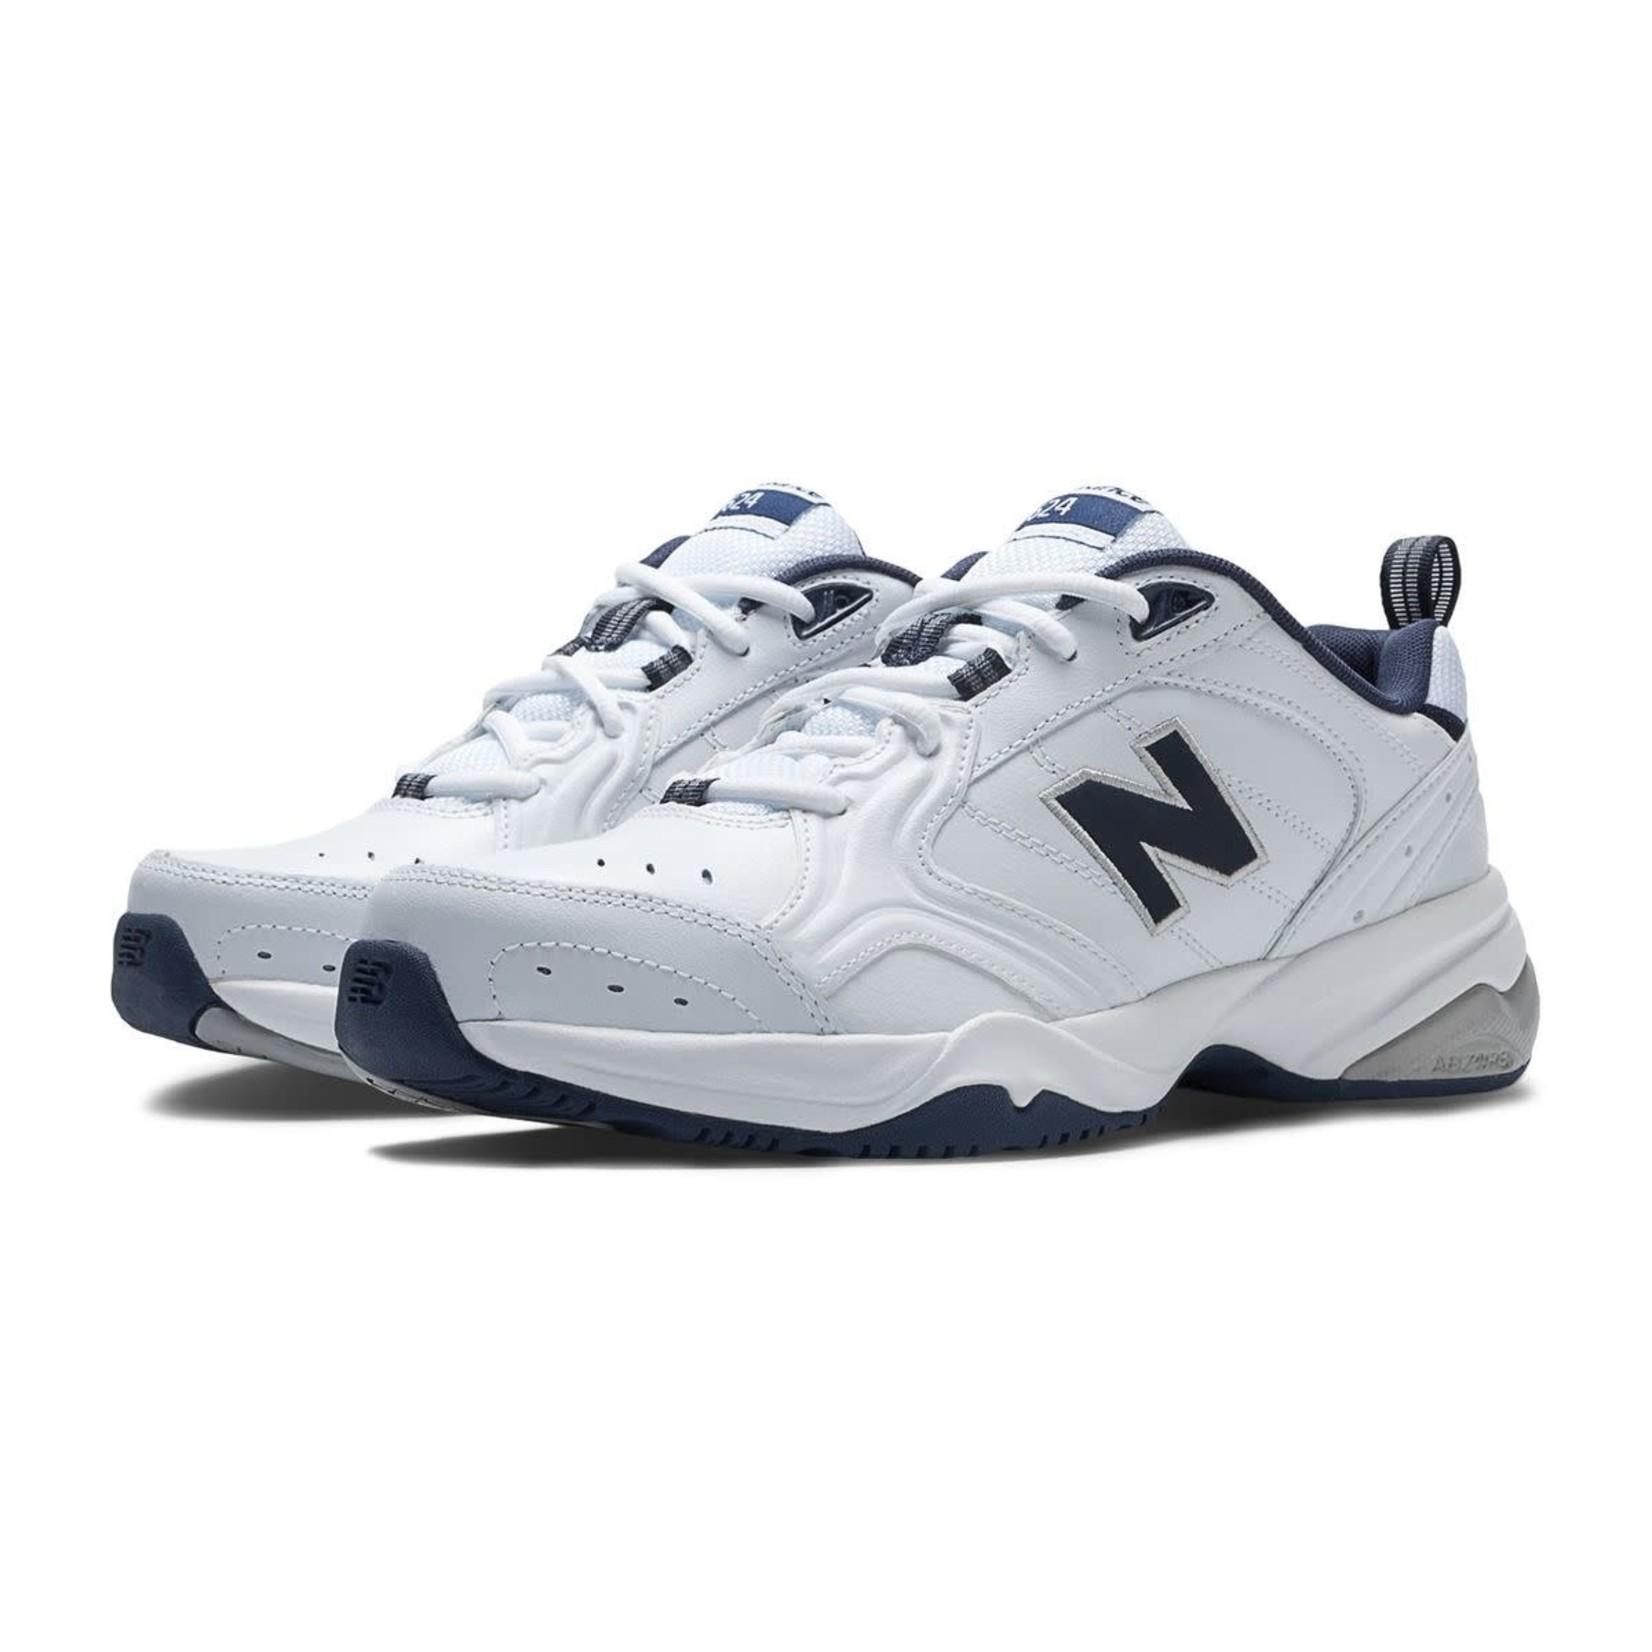 New Balance New Balance Training Shoes, MX624WN2, Mens